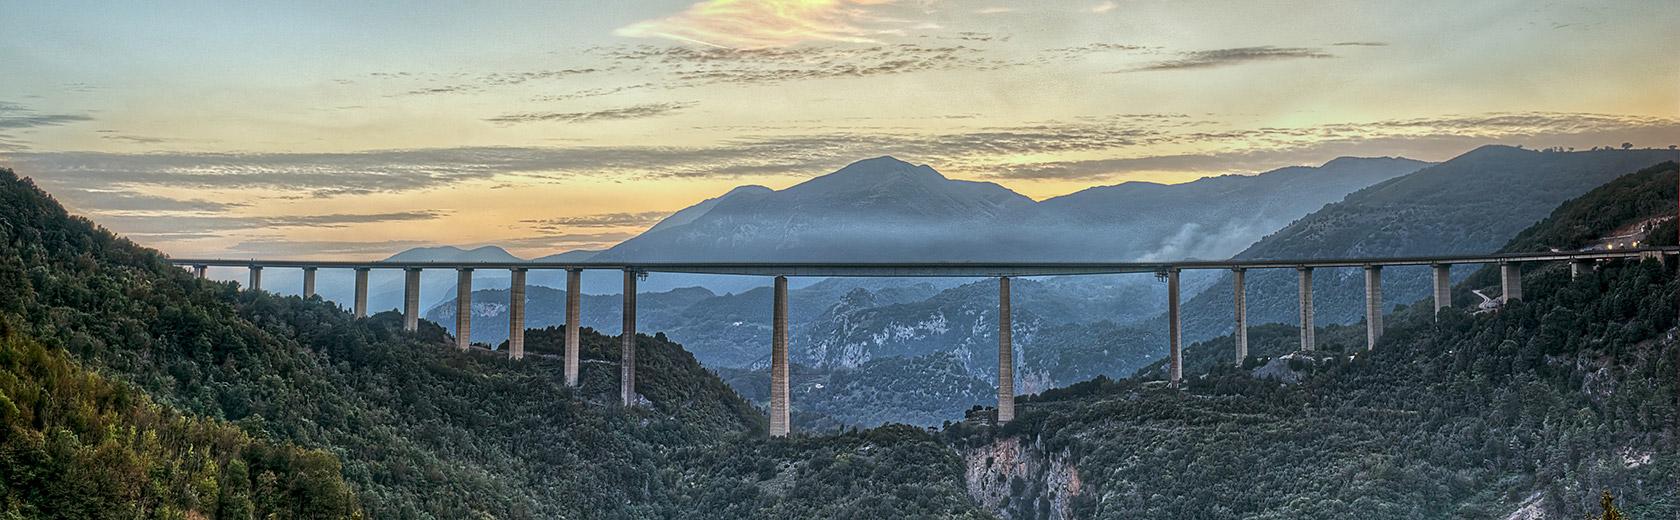 cmb-A3-SA-RC-infrastrutture-viadotto-italia